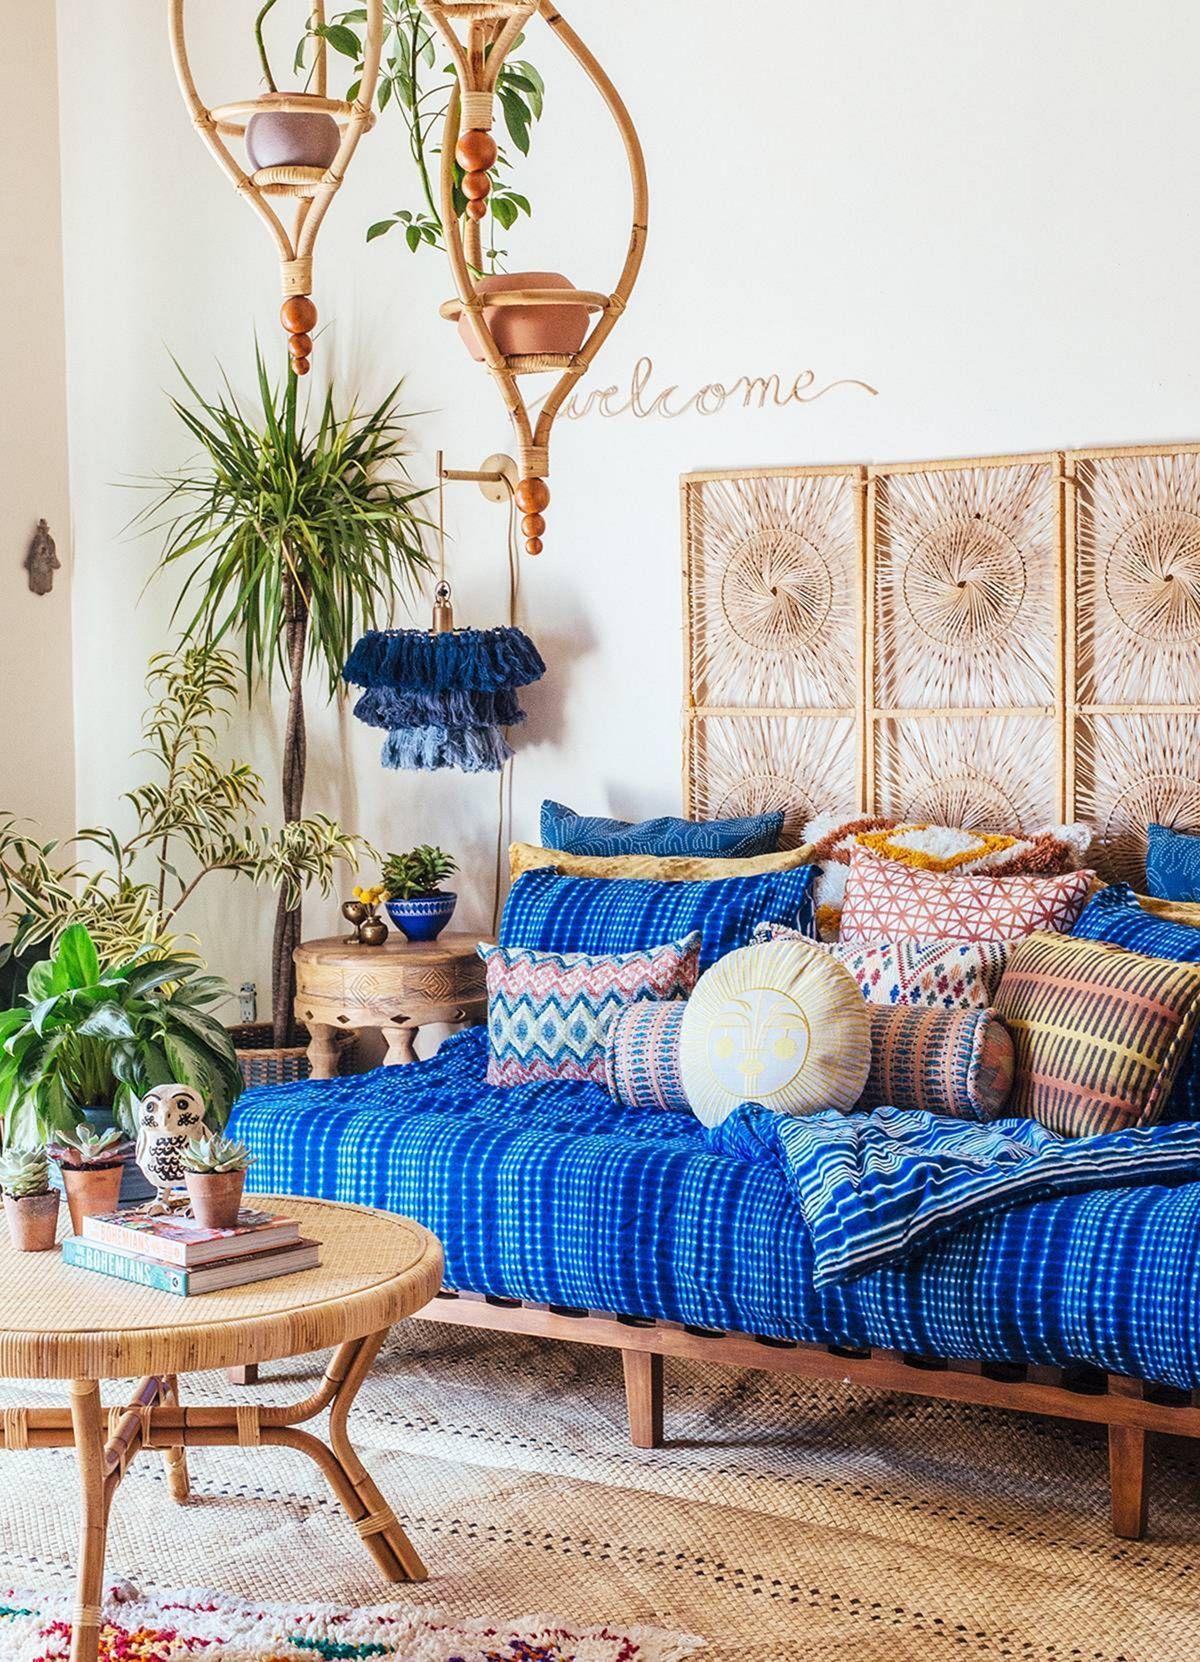 30 Best Hippie (Bohemian) Living Room Design Ideas That ... on Bohemian Living Room Decor Ideas  id=11649